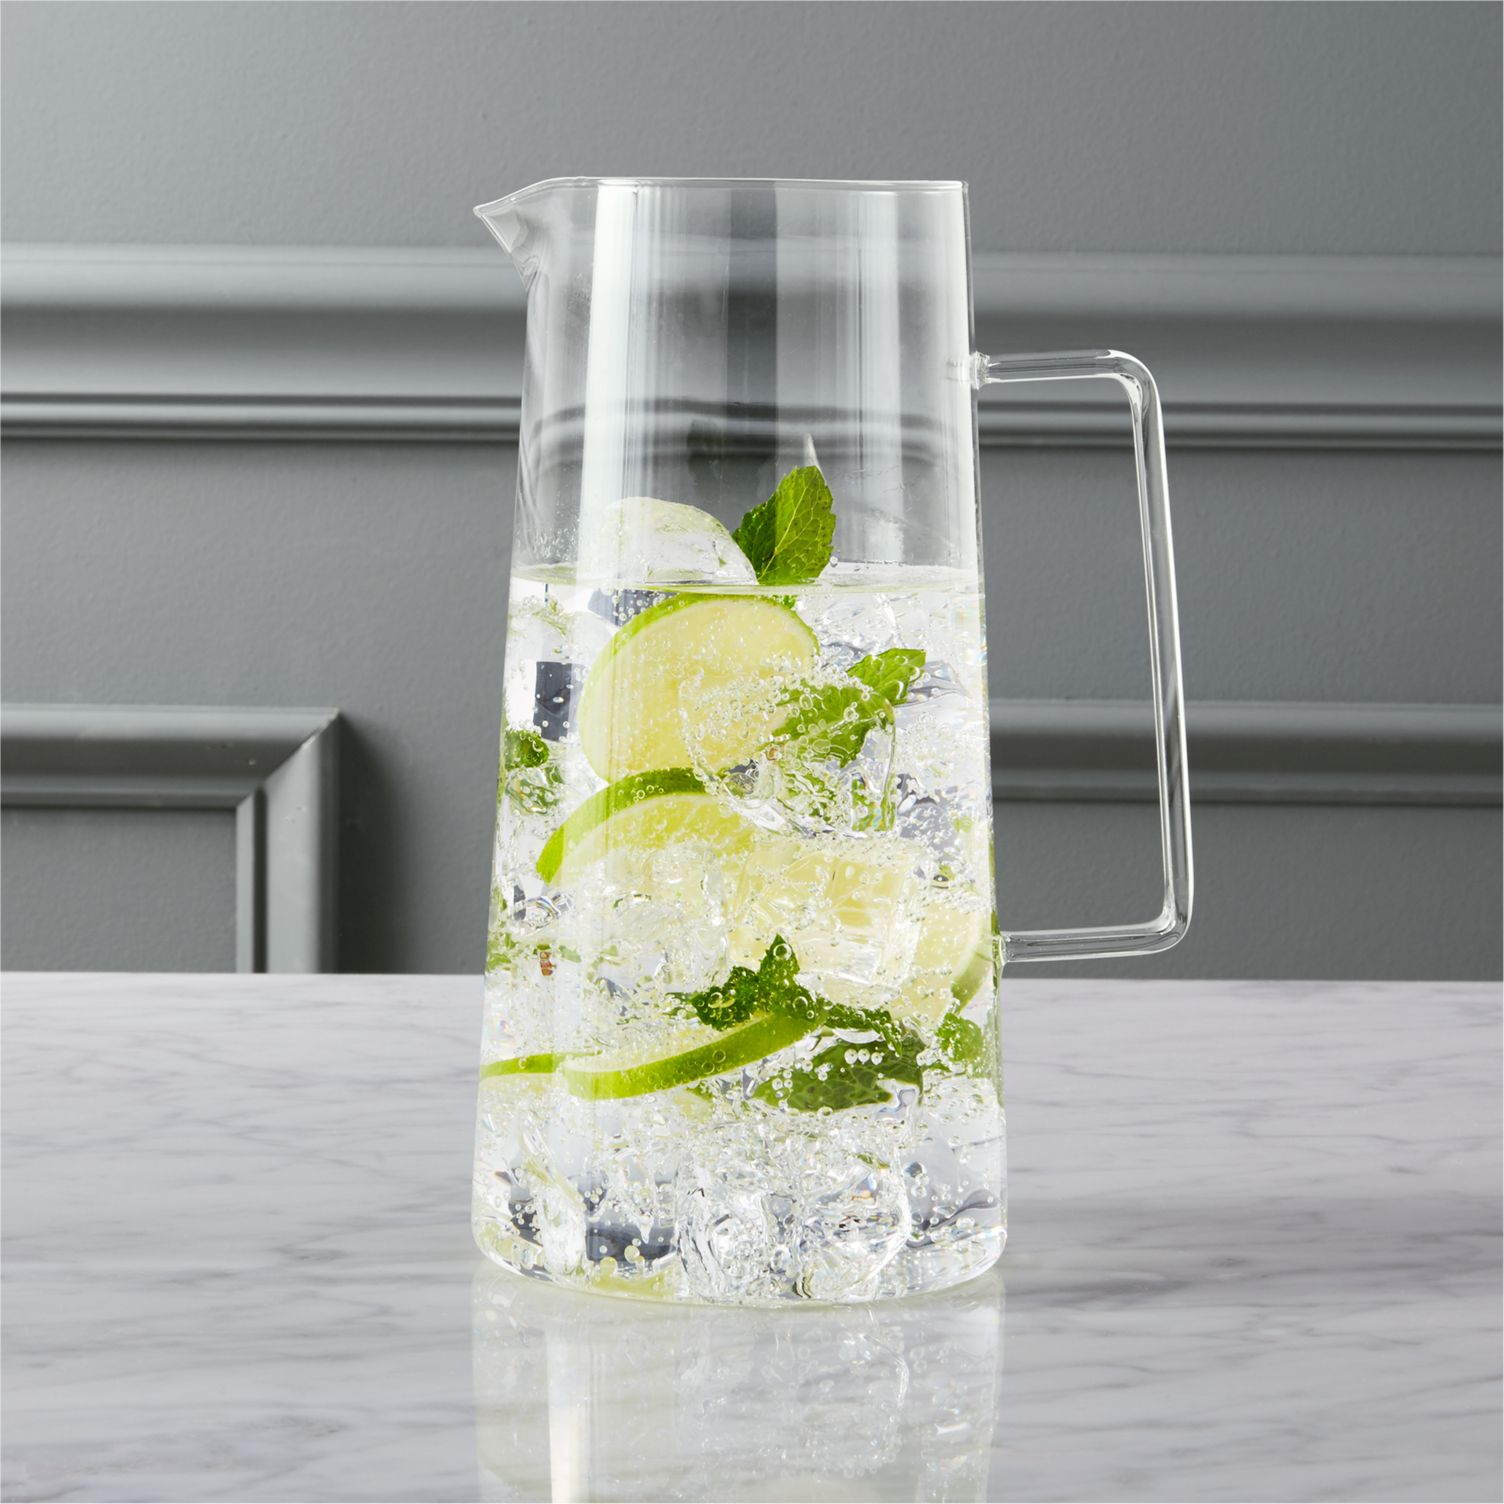 Beaker glass pitcher from CB2